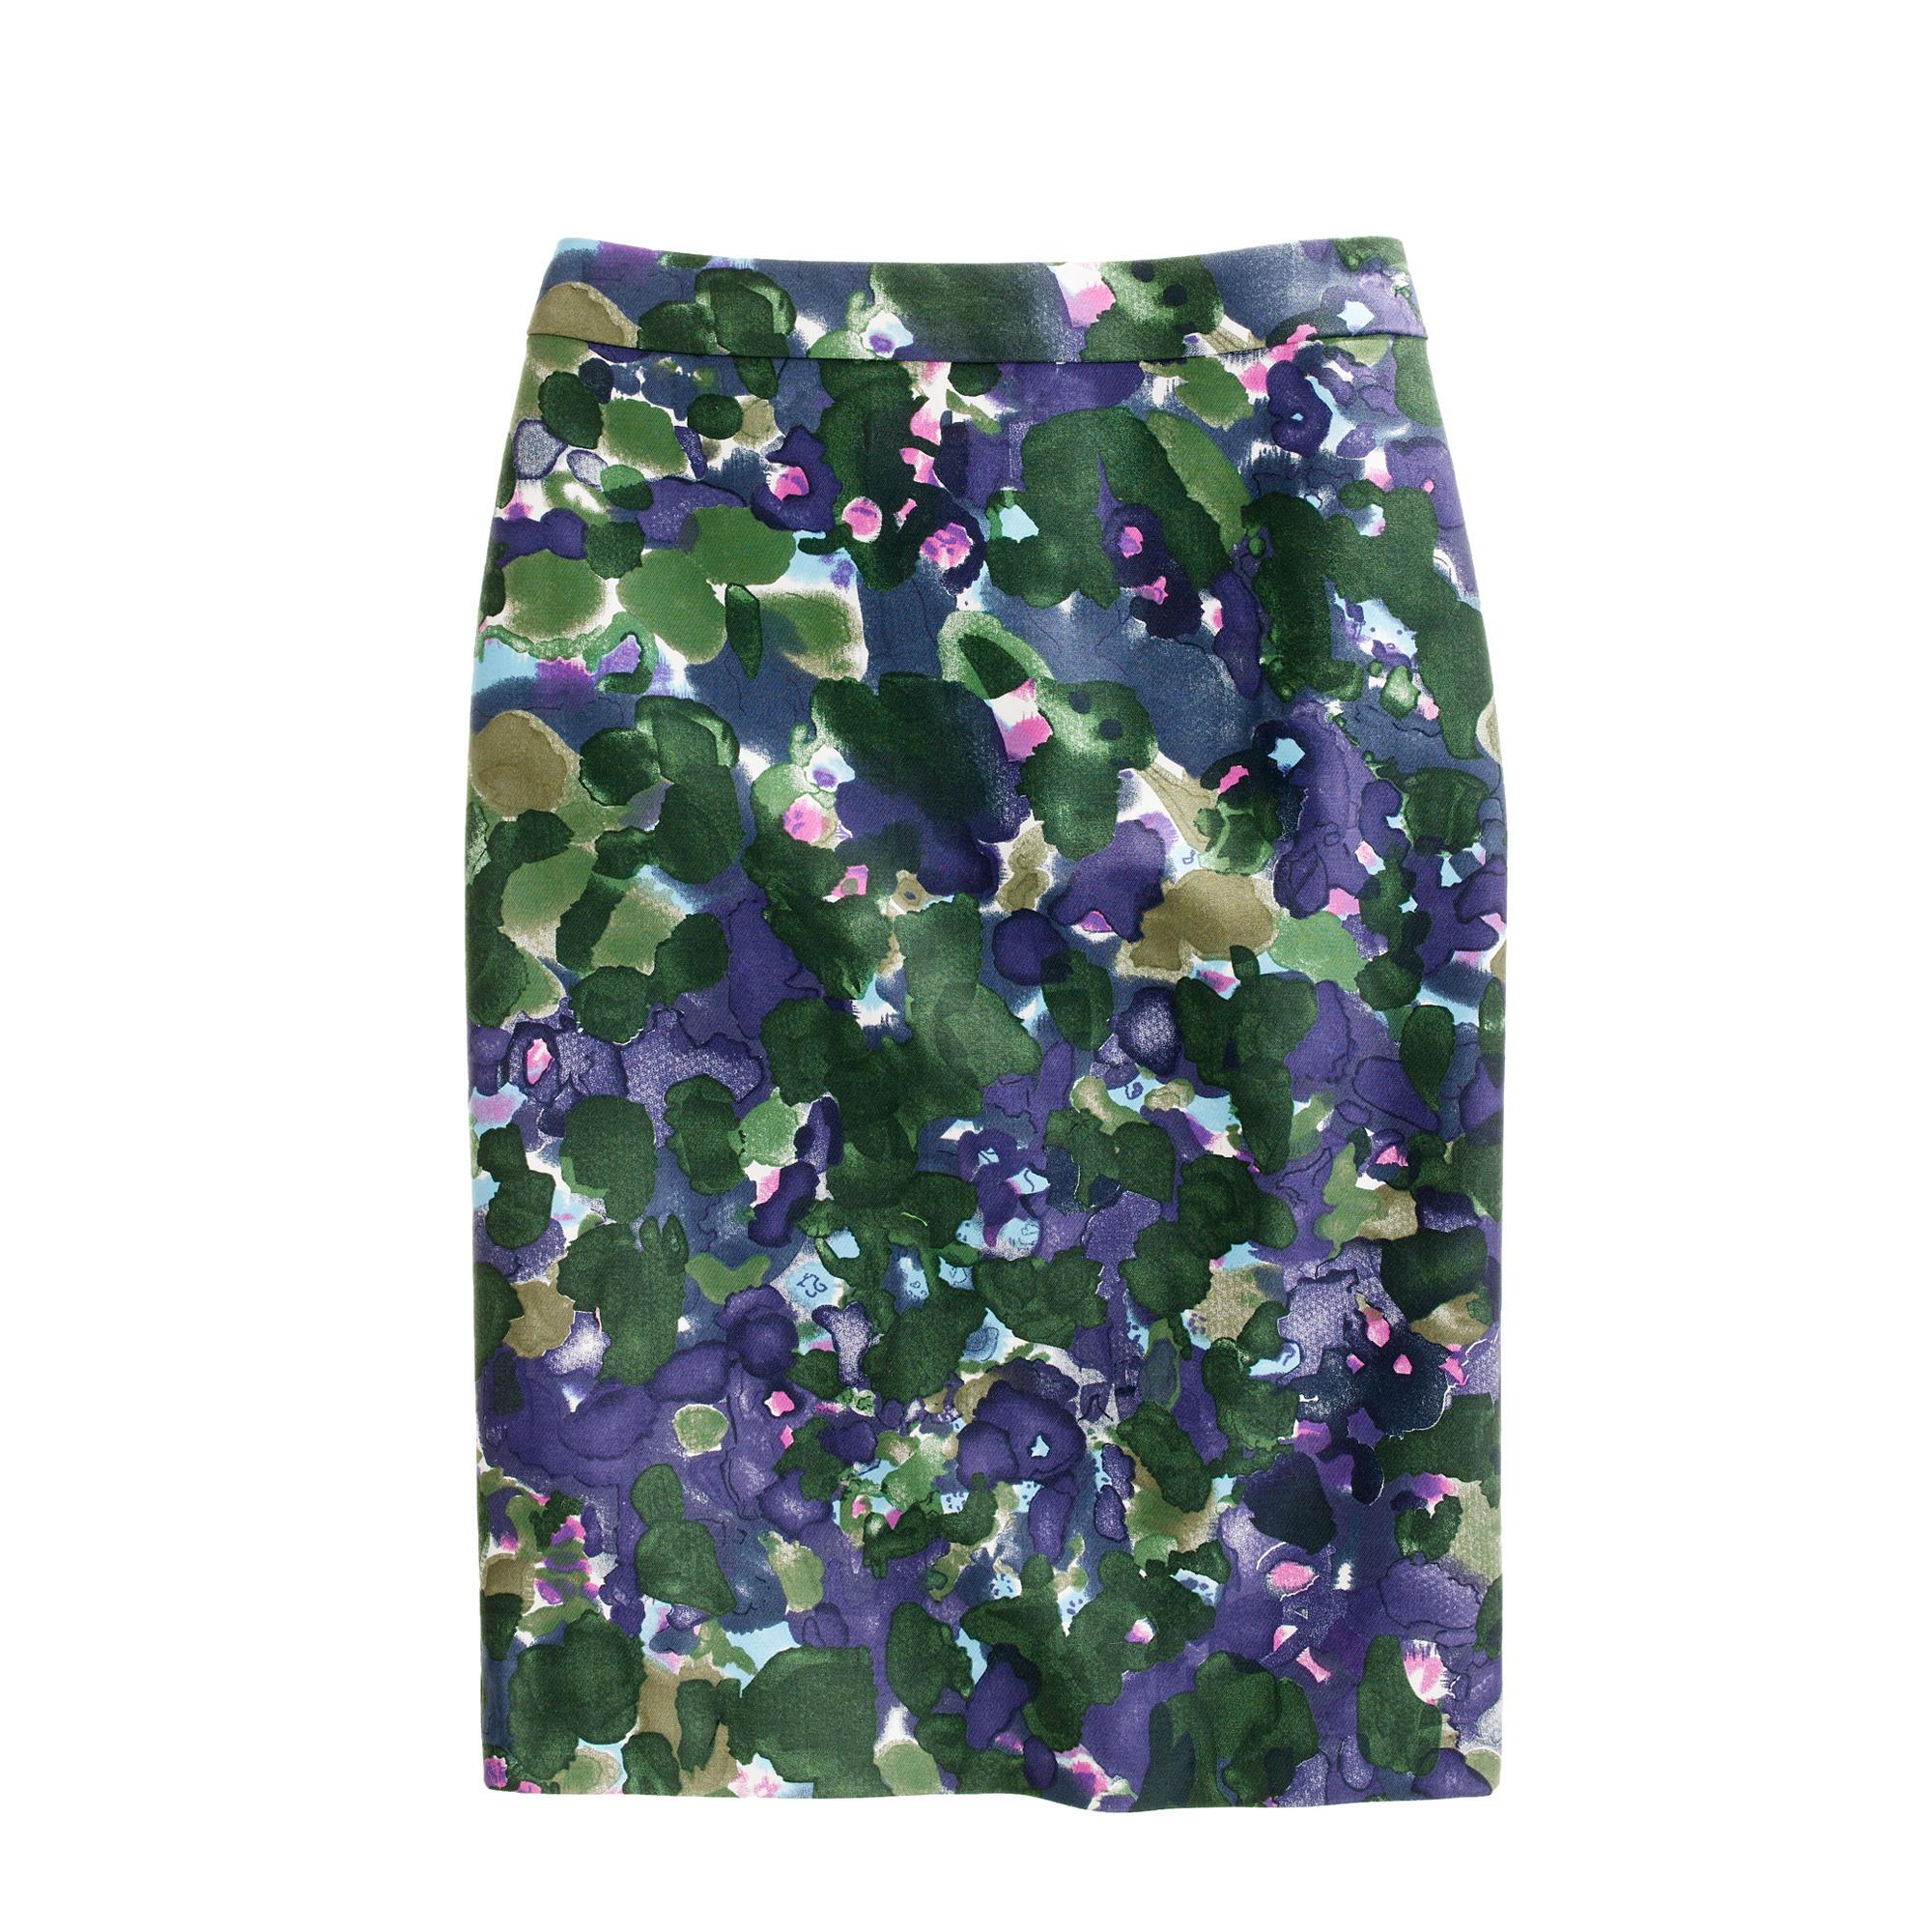 Petite No. 2 pencil skirt in gardenshade floral :   J.Crew